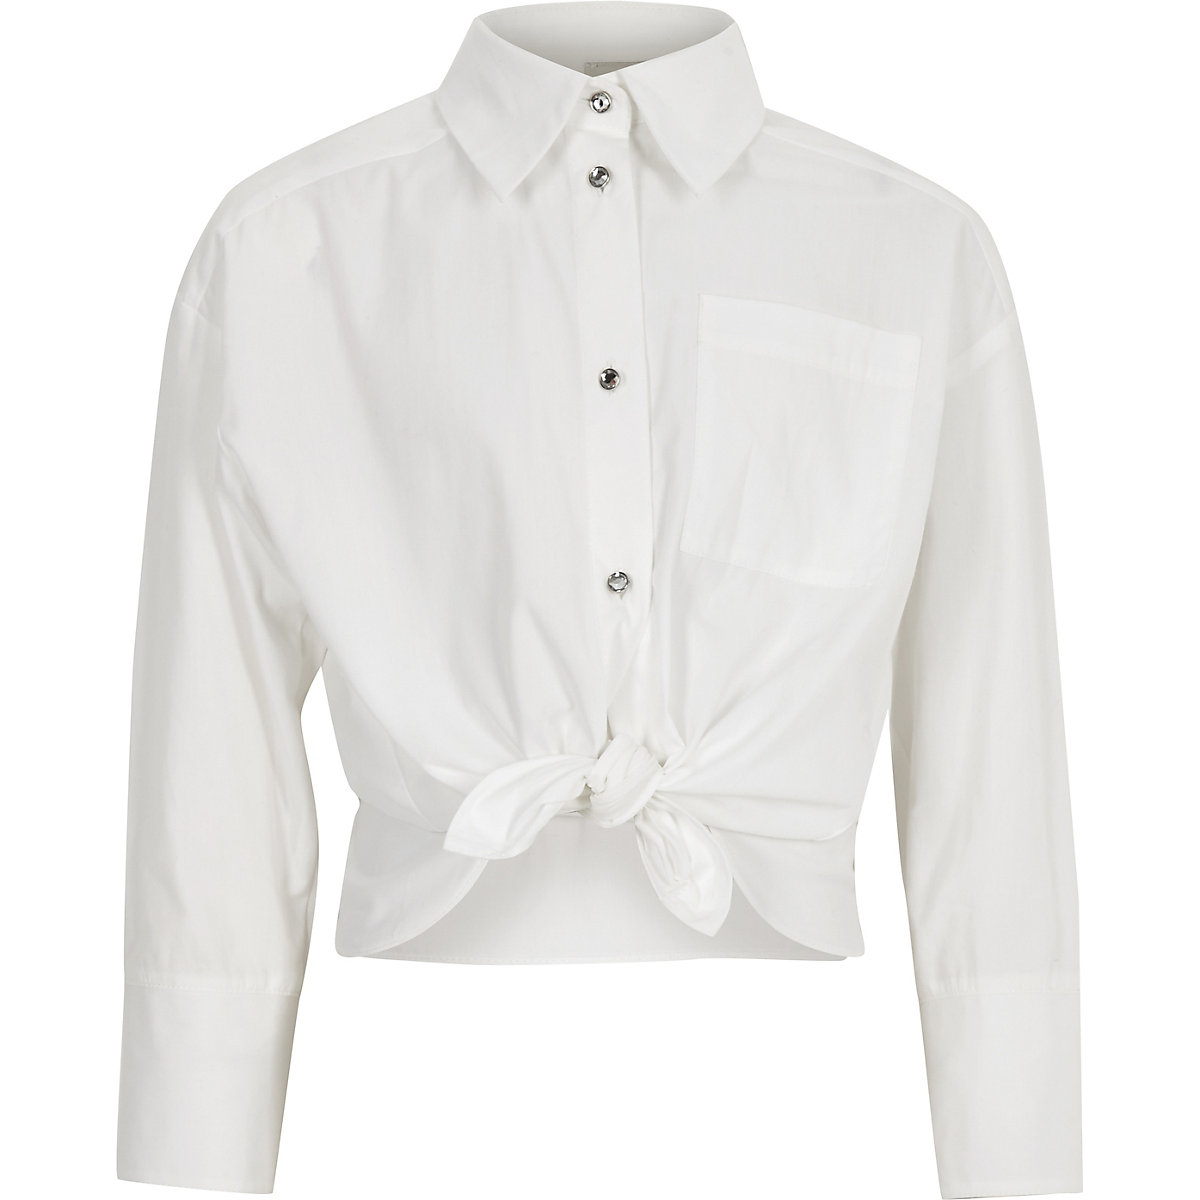 Girls white poplin jewel button shirt